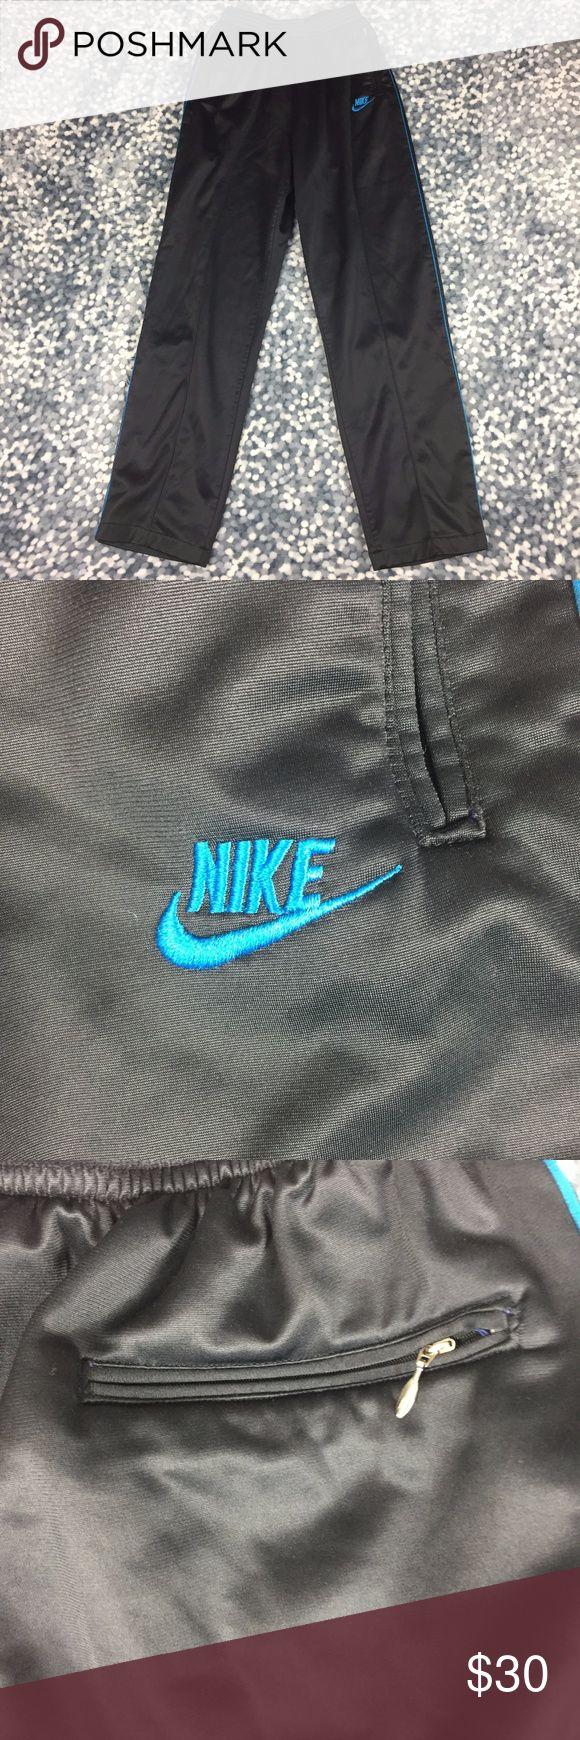 Nike Fleece Lined Athletic Sports Long Pants 247C5 Nike Fleece Lined Athletic Long Pants Men's Large Sweat Basketball Track Warmup. Nike Pants Sweatpants & Joggers